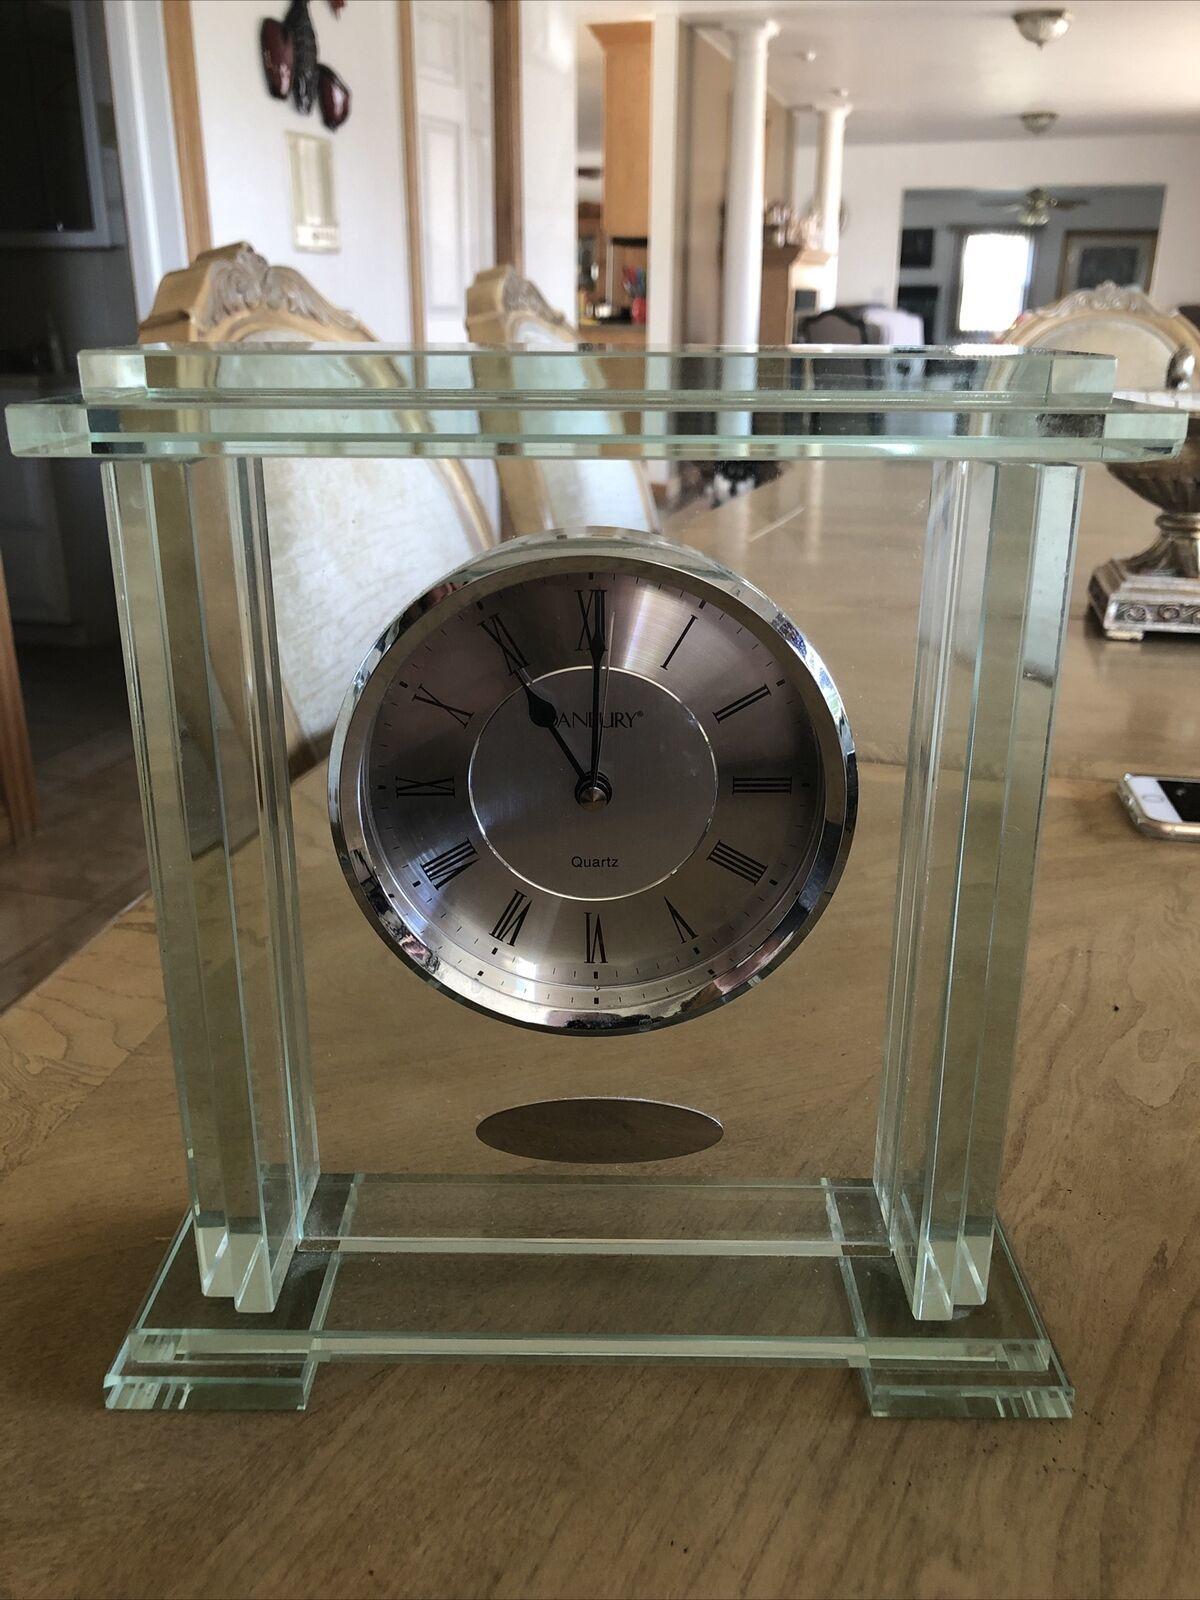 "DANBURY Glass Clock Things Remembered Mantle Shelf Desk Quartz 10"" T x 9.5"" W - $46.98"